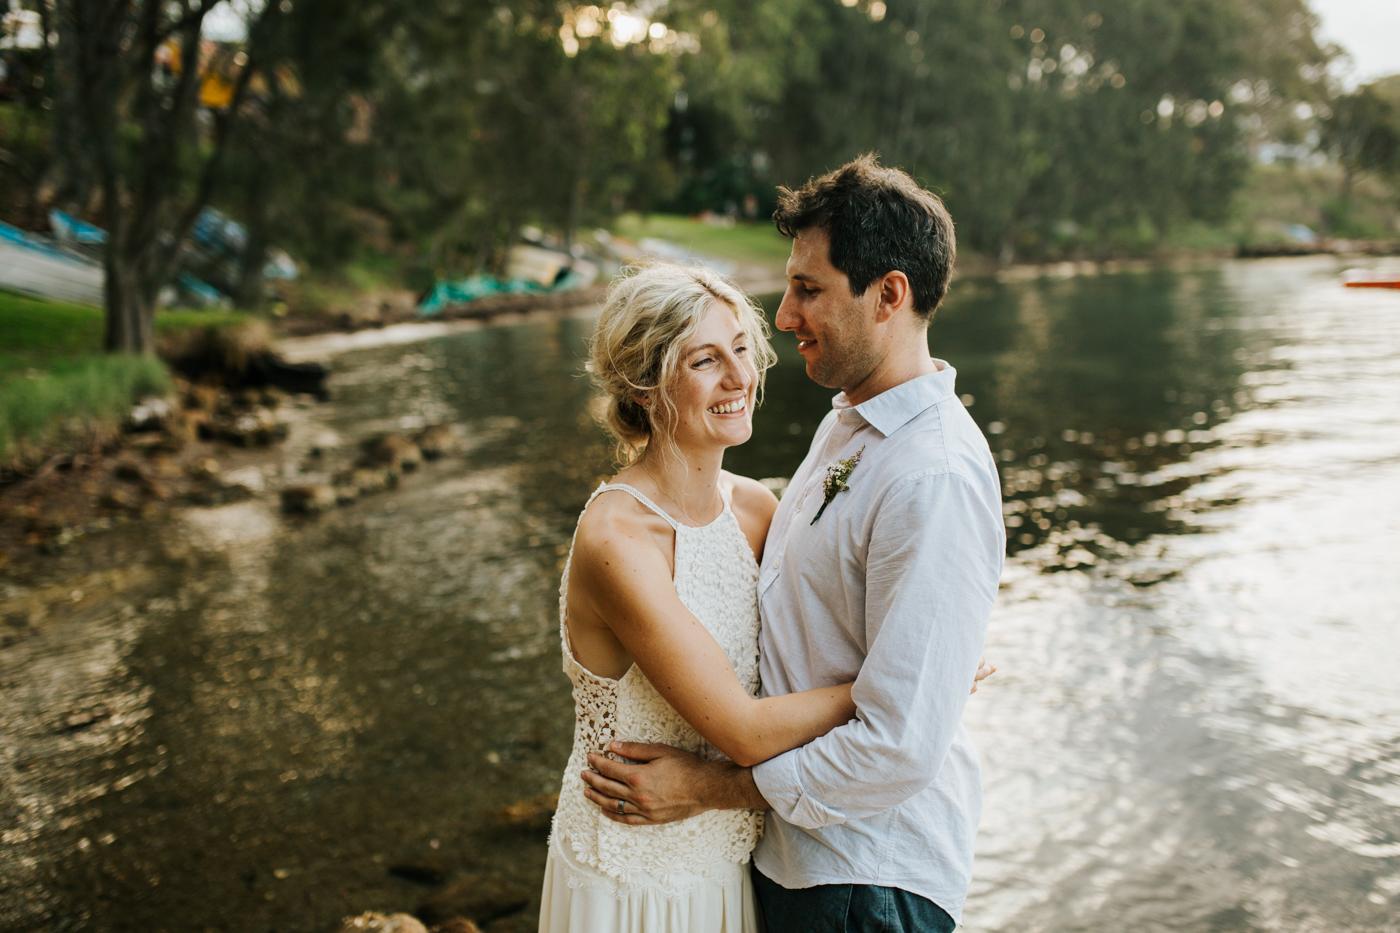 Emma & Ben - Lake Macquarie - Hunter Valley Wedding - Samantha Heather Photography-209.jpg